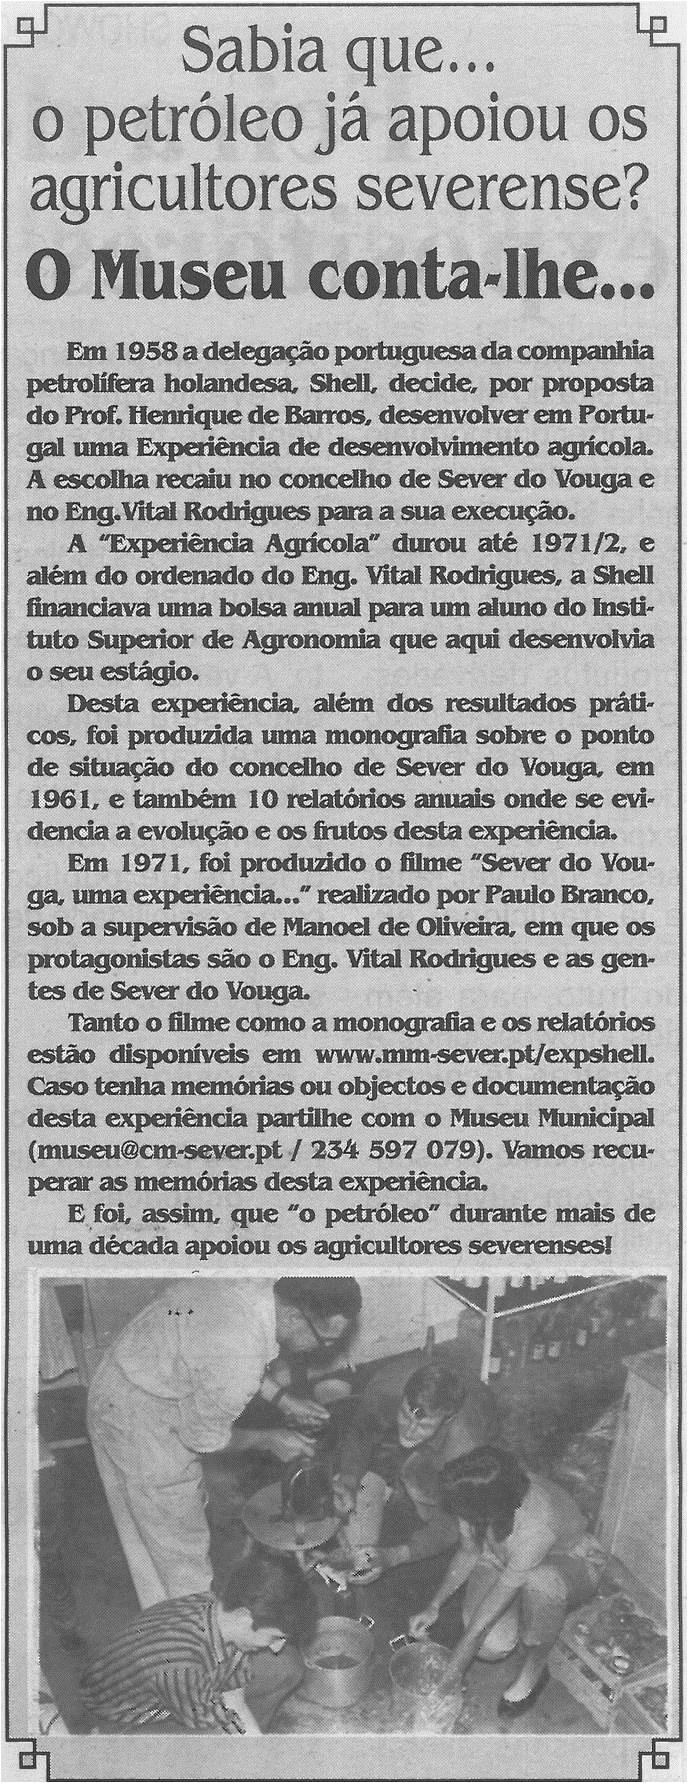 BV-2.ªjun.'21-p.4-O Museu conta-lhe : sabia que o petróleo já apoiou os agricultores portugueses.jpg